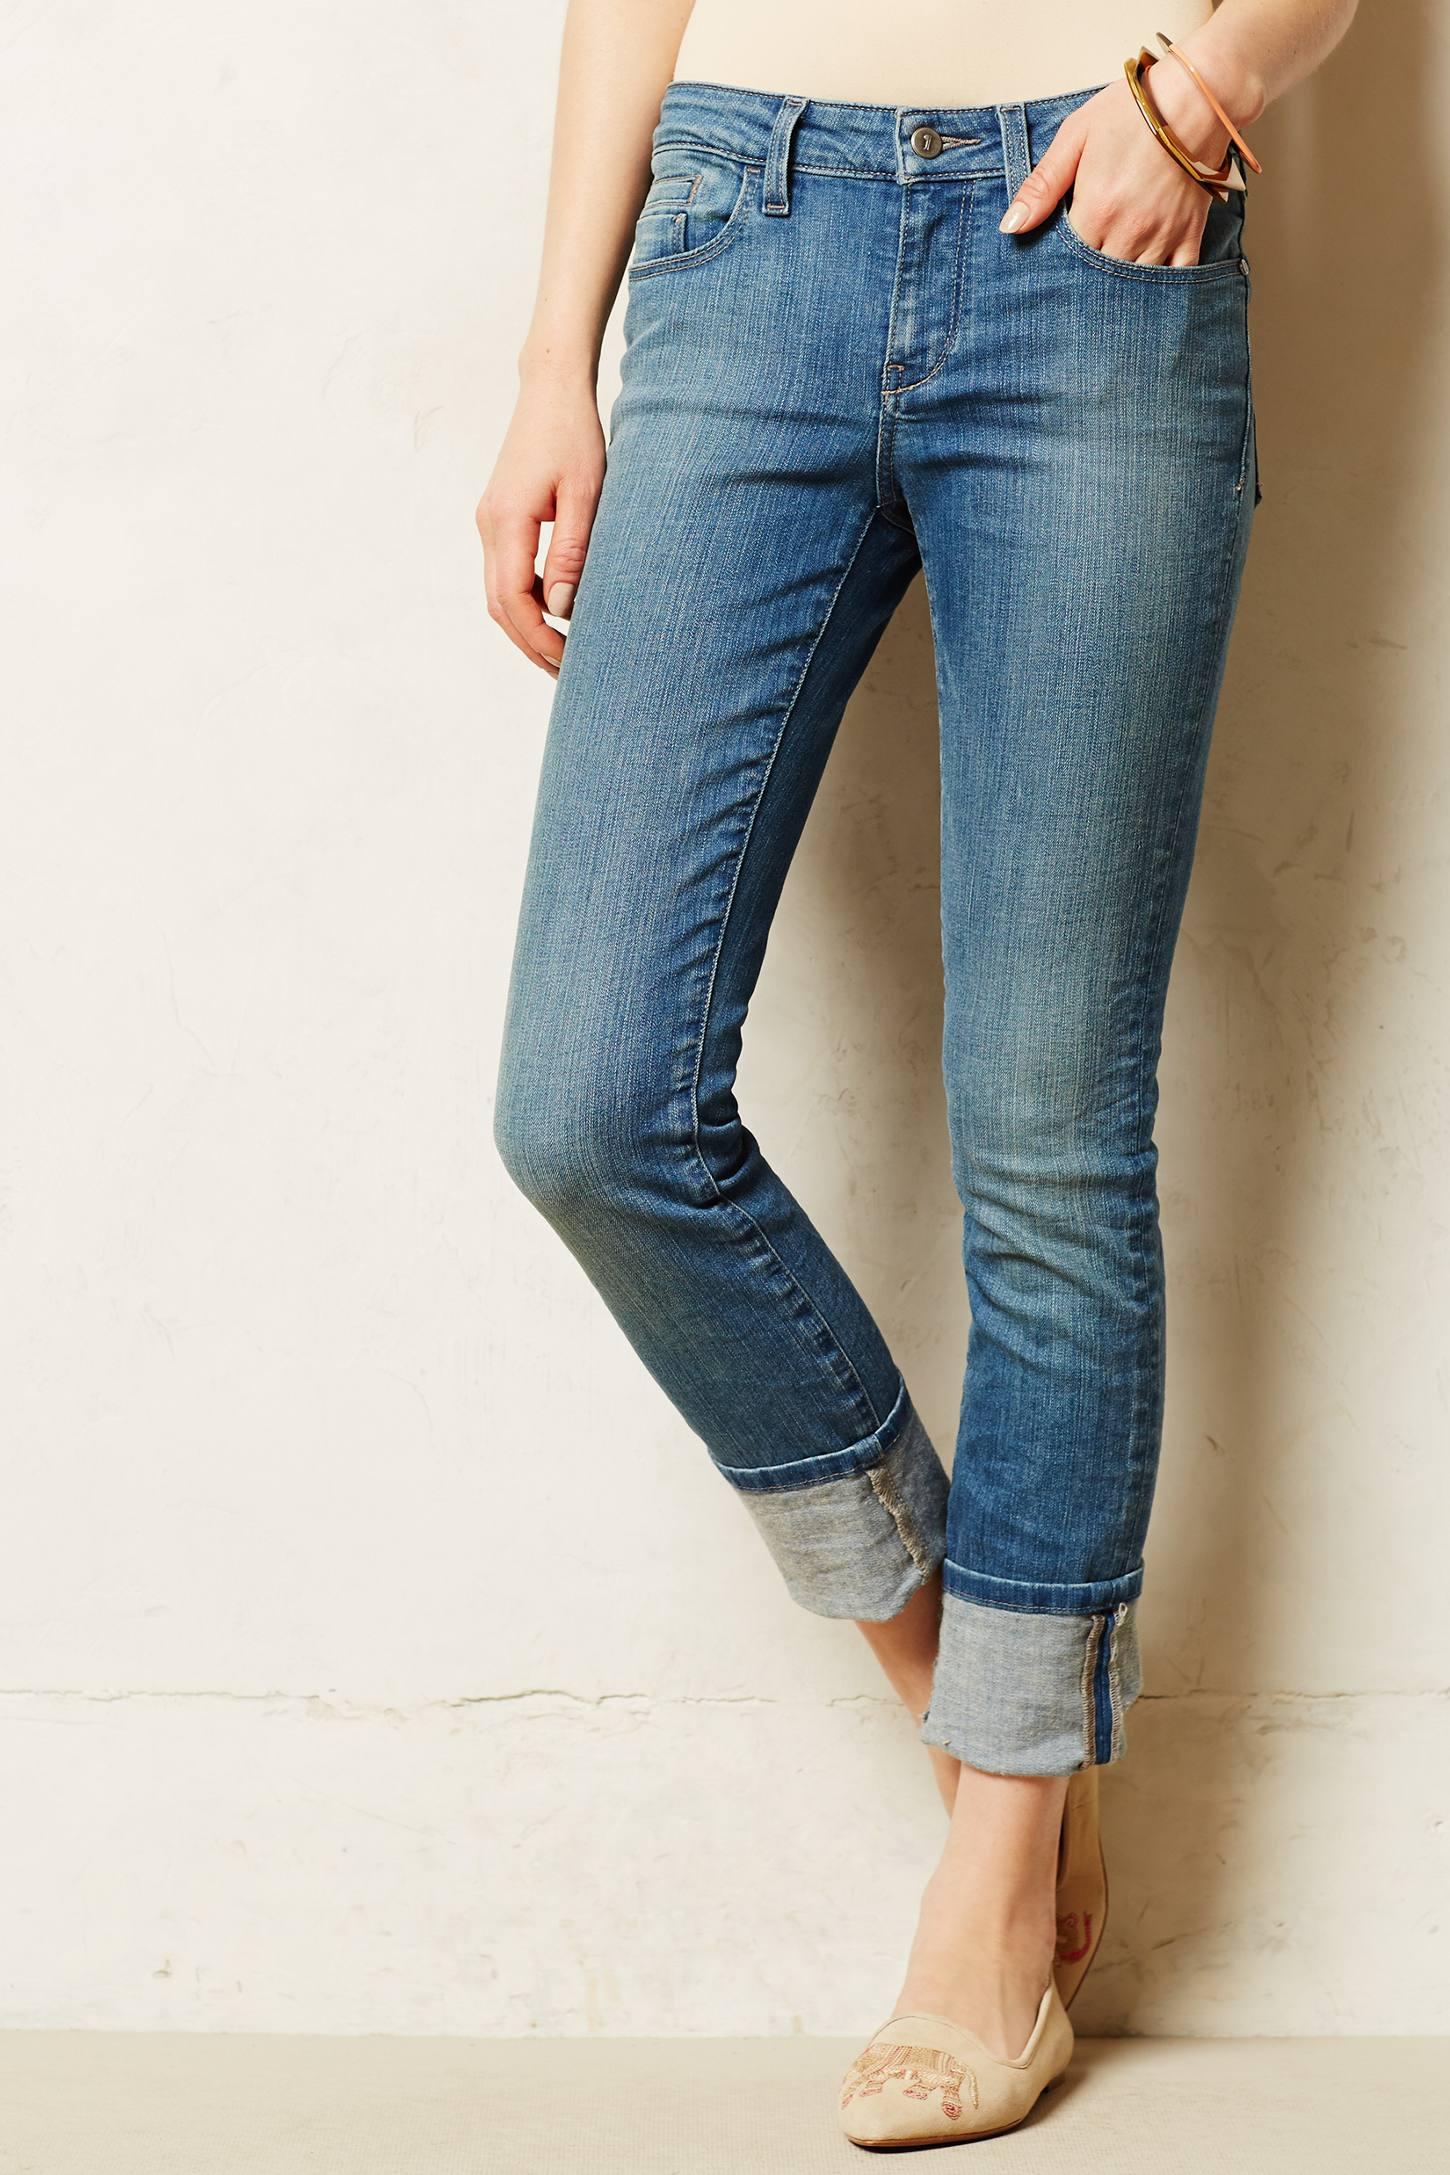 Khaki Skinny Jeans Womens